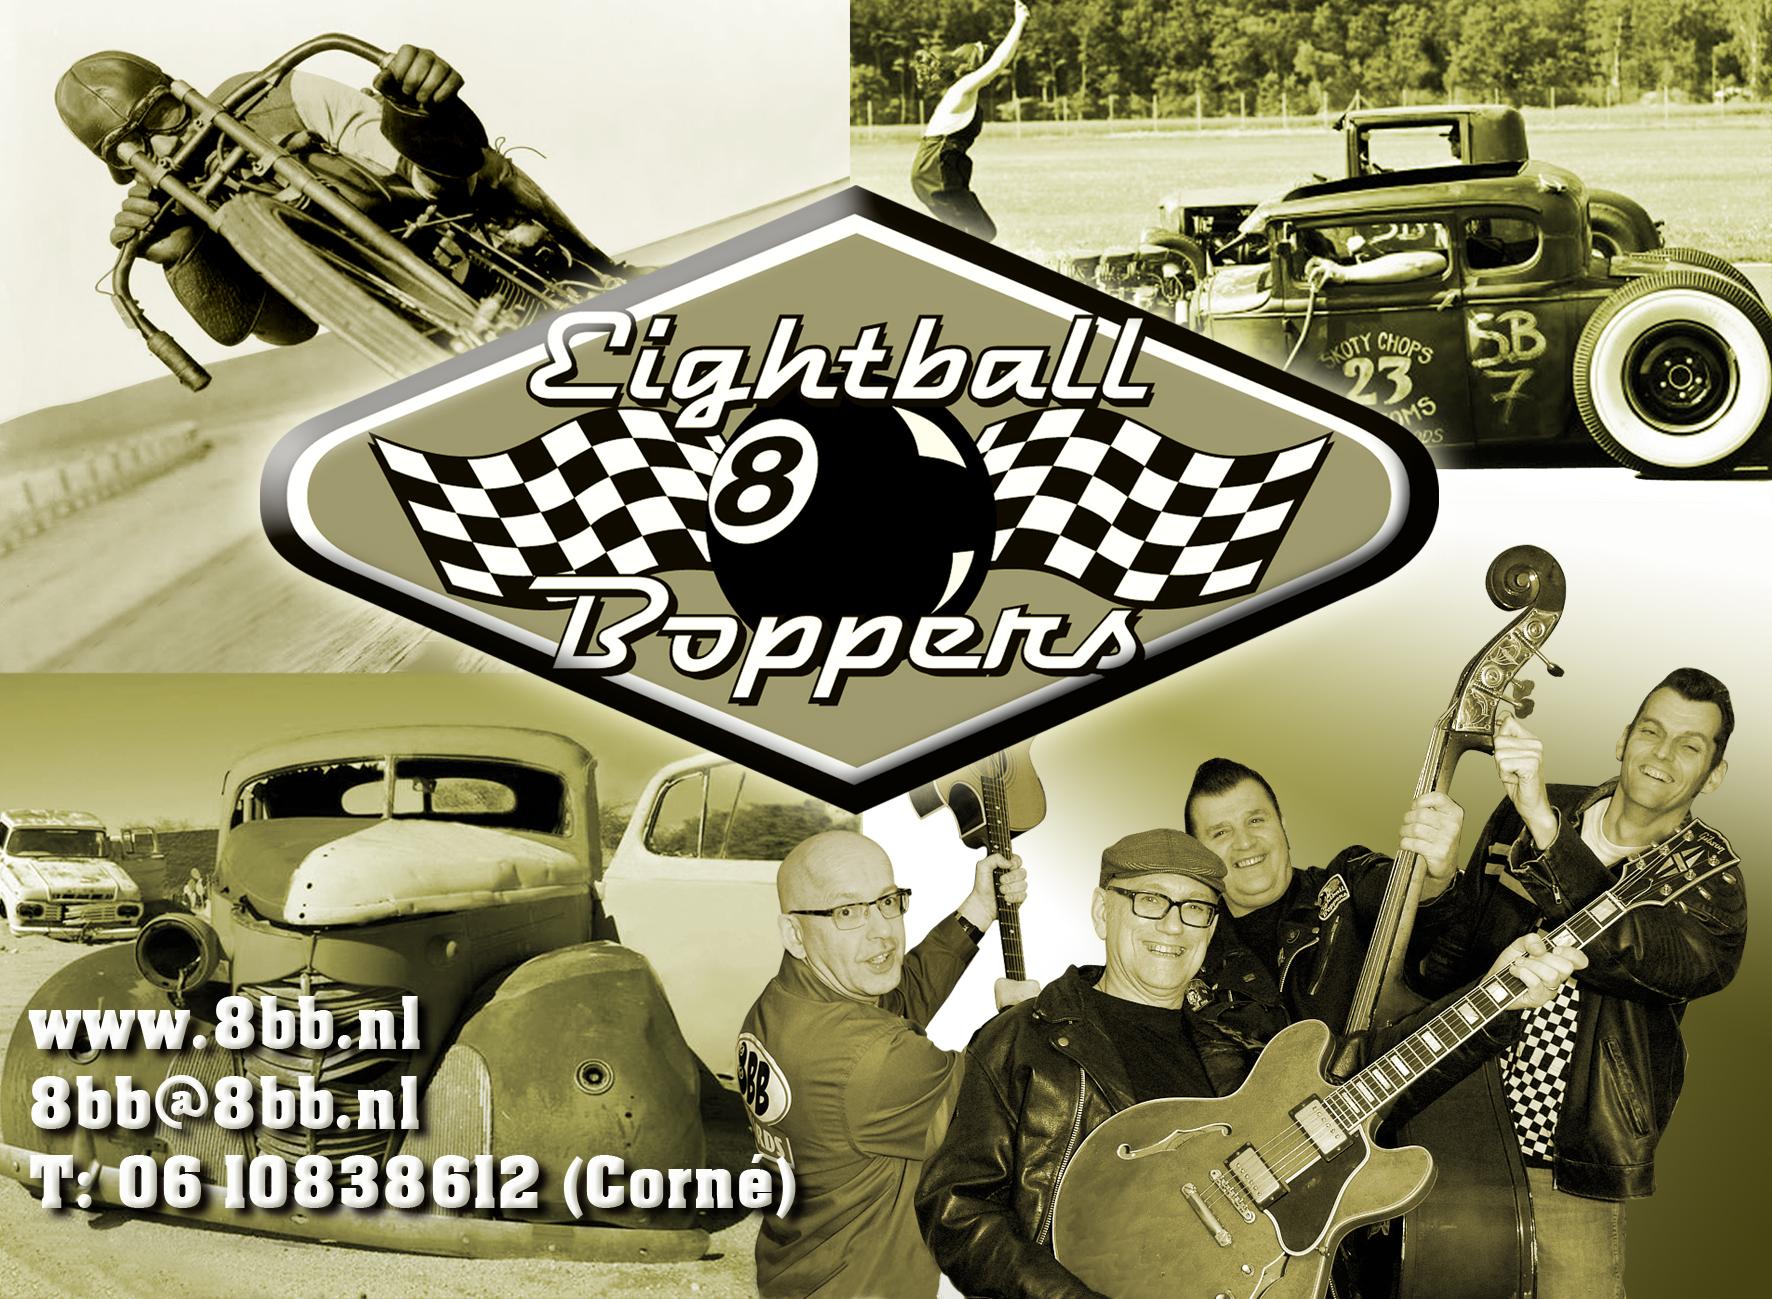 eightball Boppers